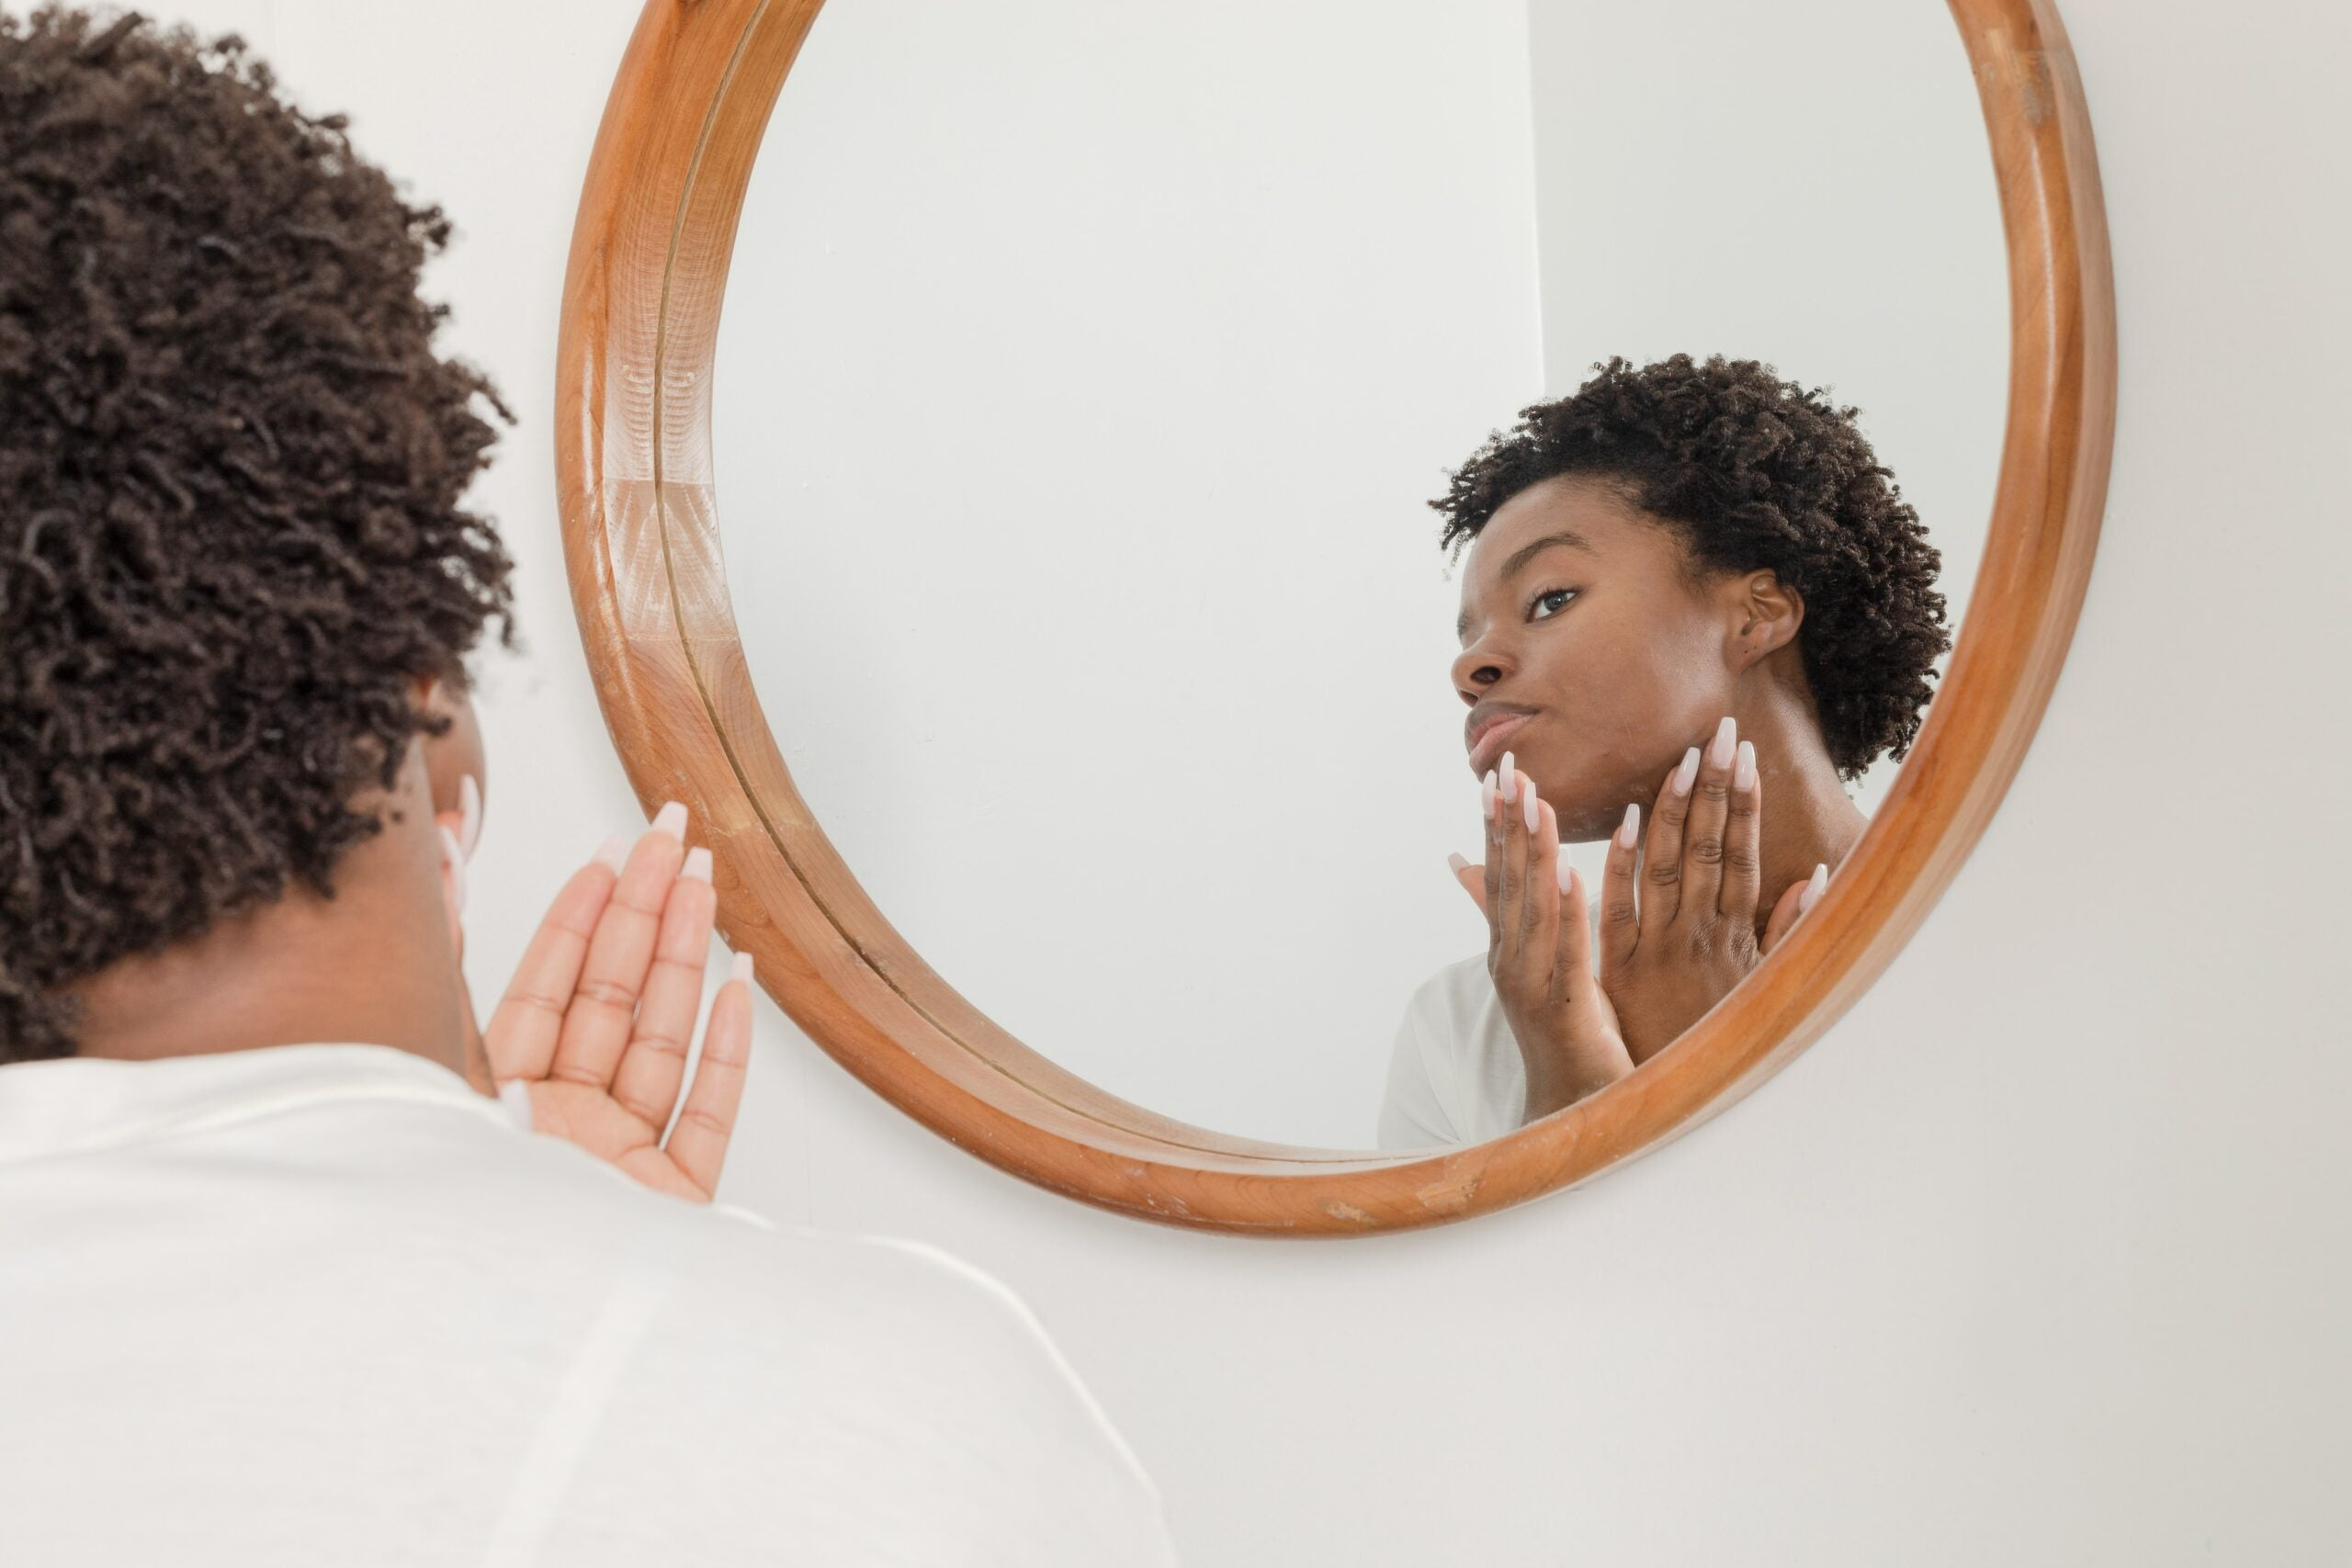 Woman applying lotion in mirror